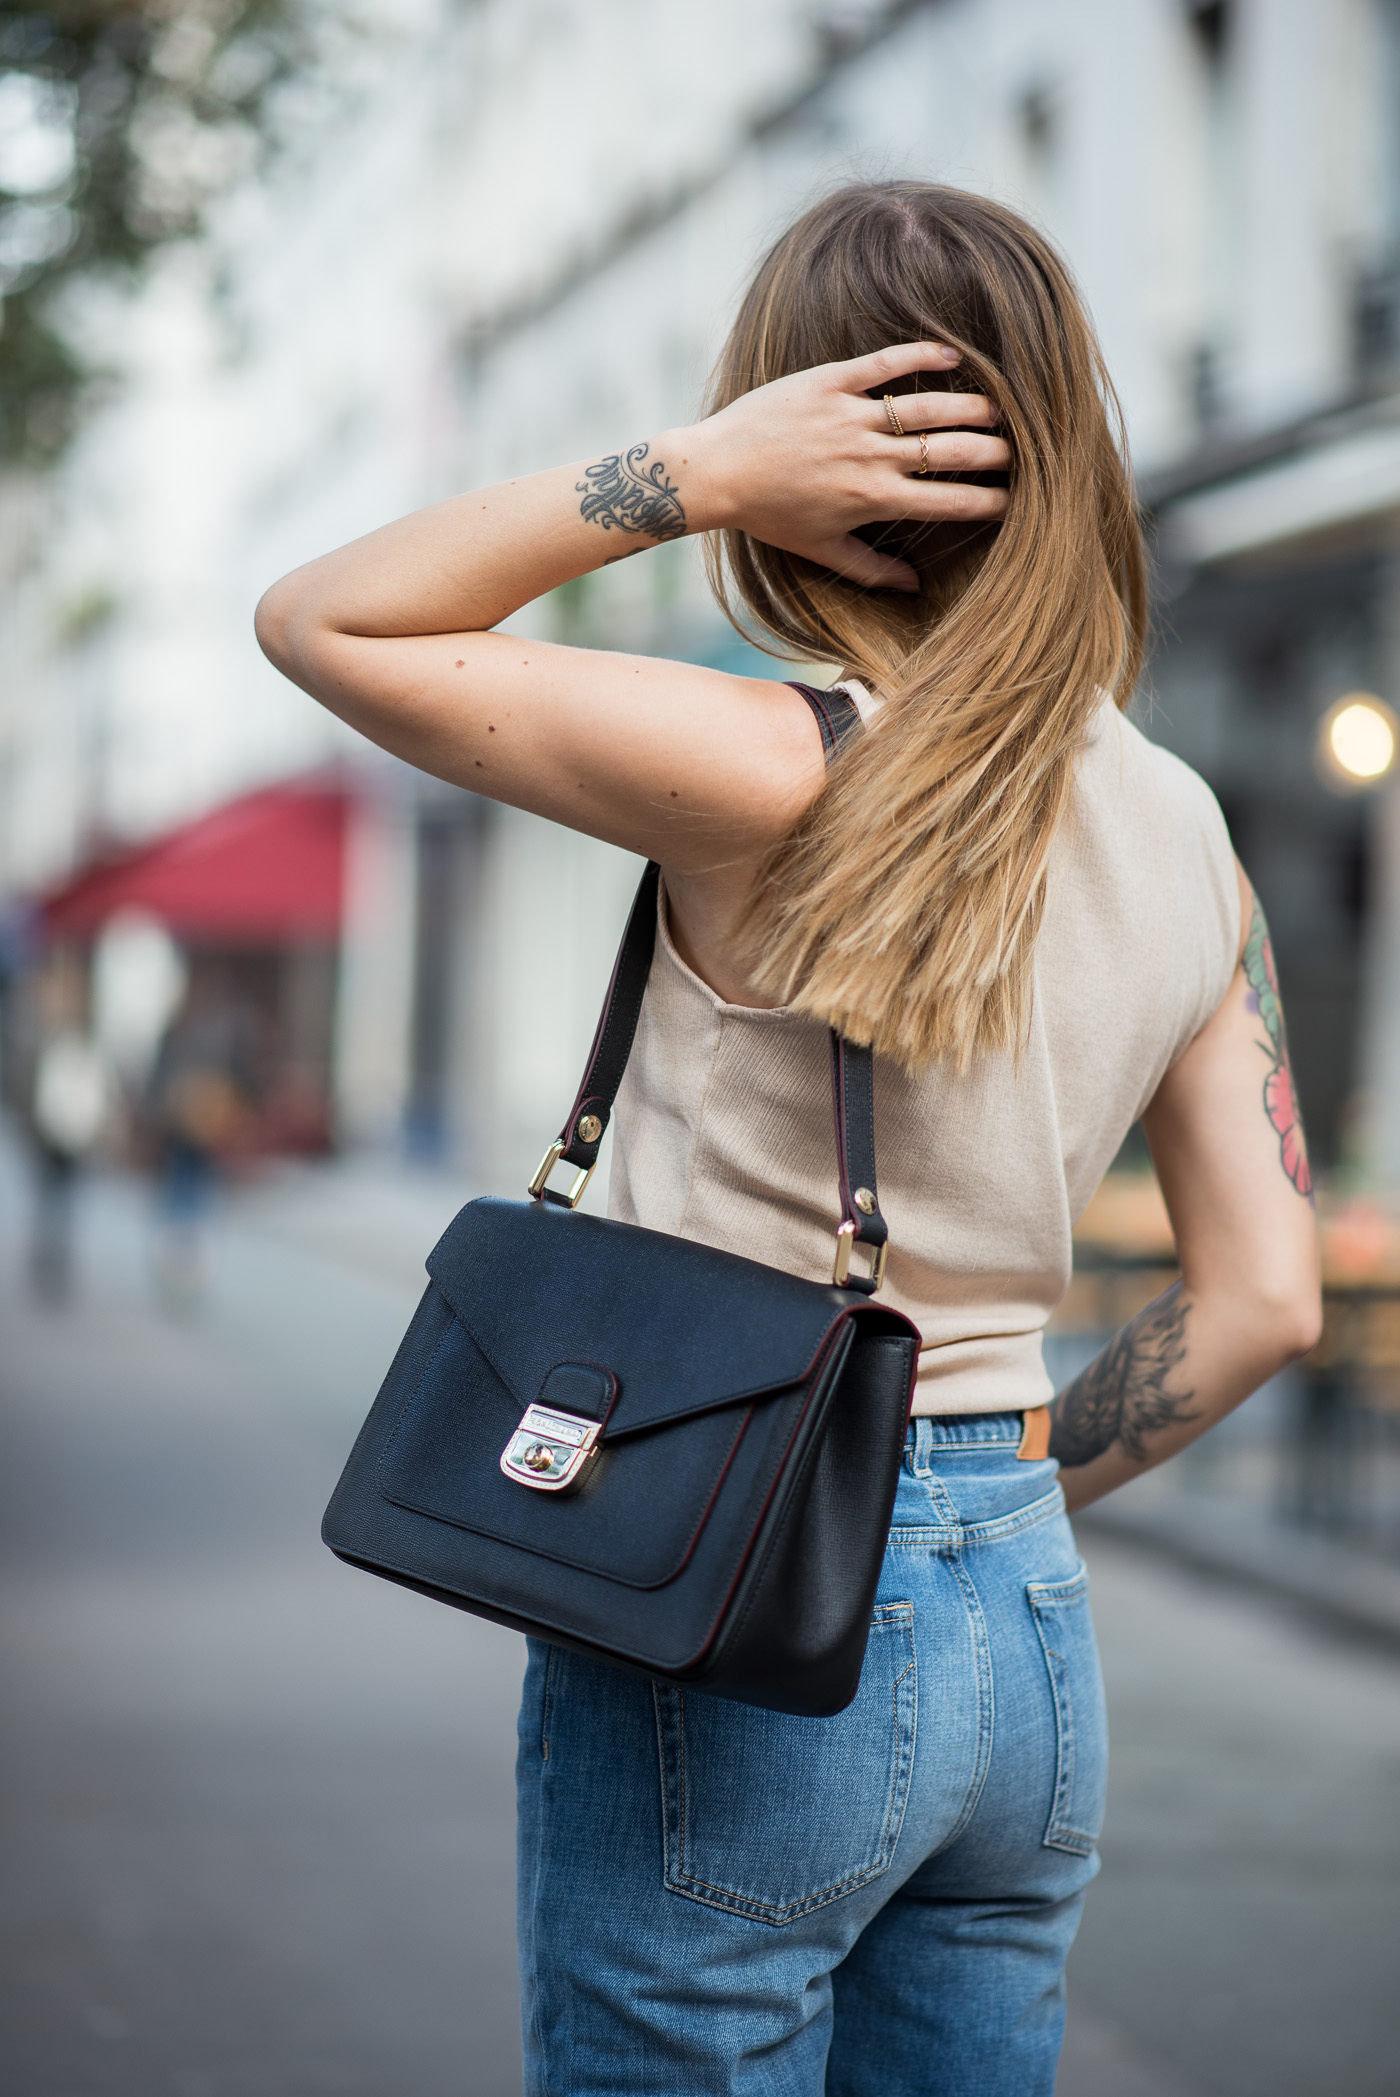 paris_fashion_week_leather_jacket_selected_femme_4